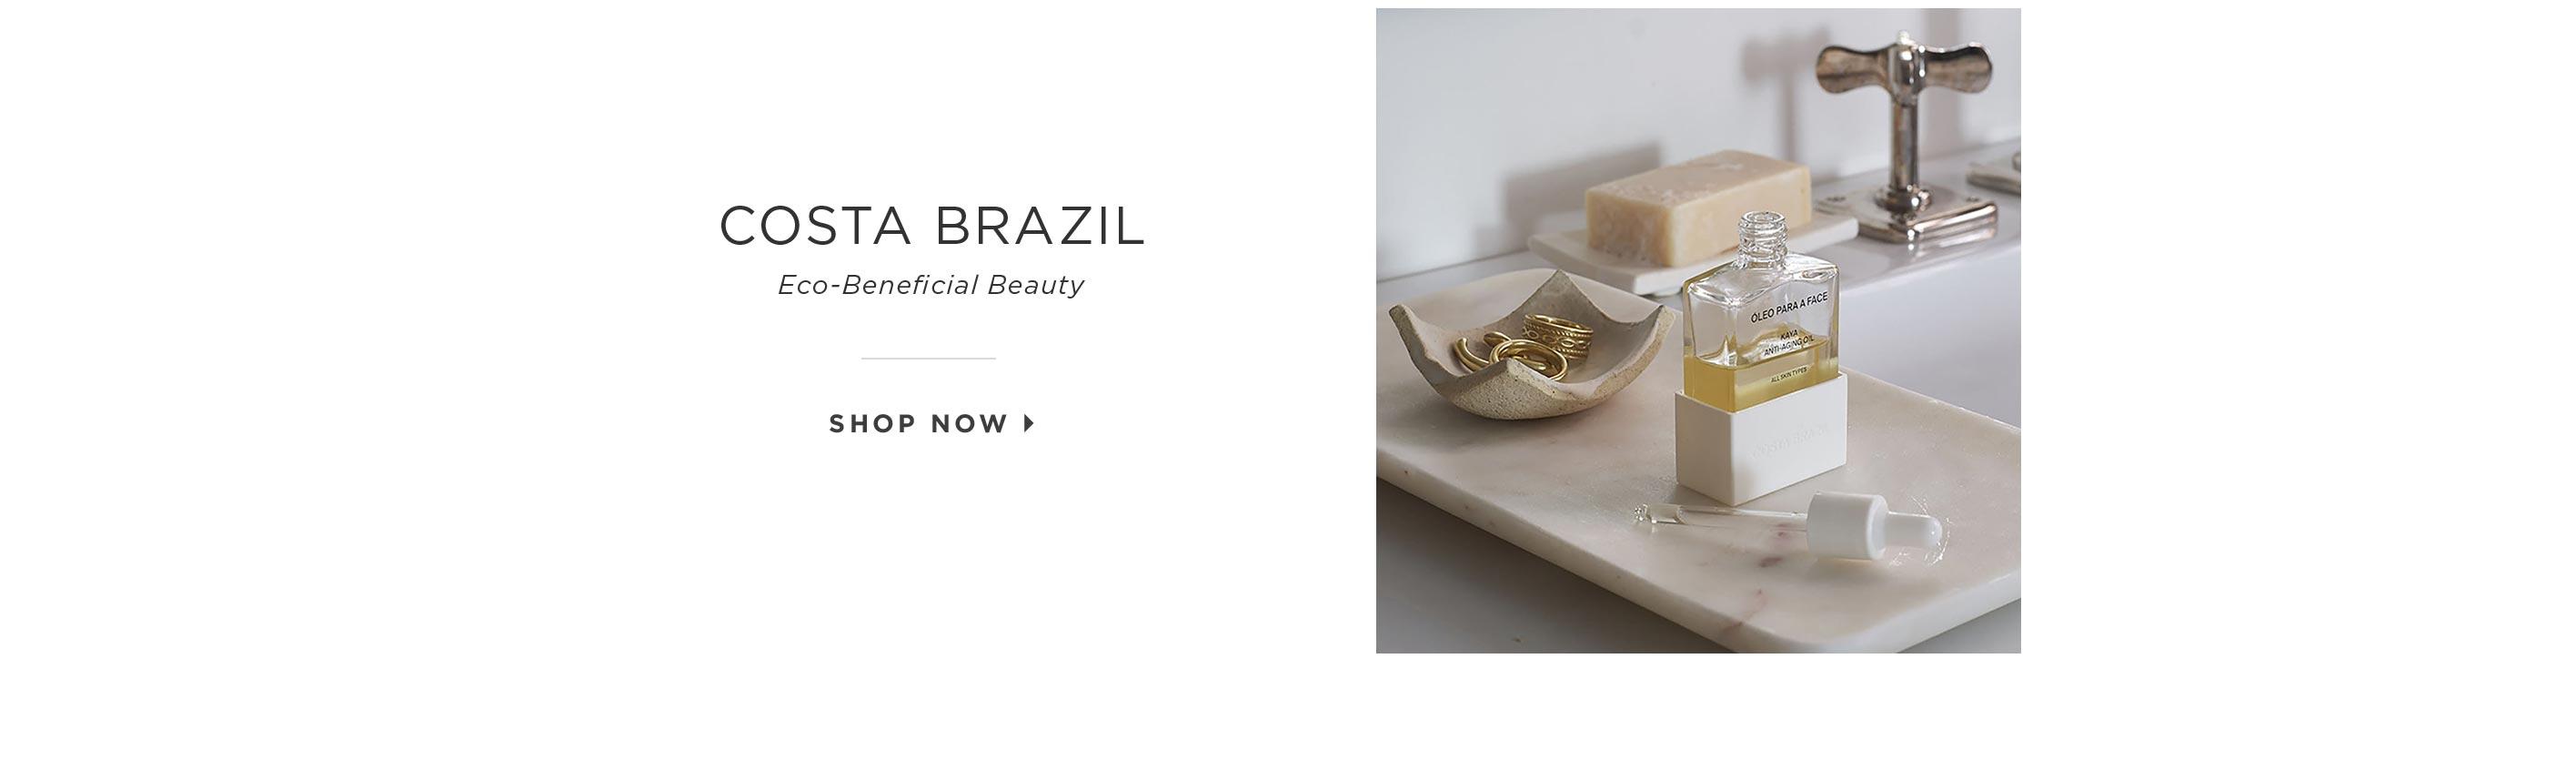 Costa Brazil – Eco-Beneficial Beauty. Shop Now.